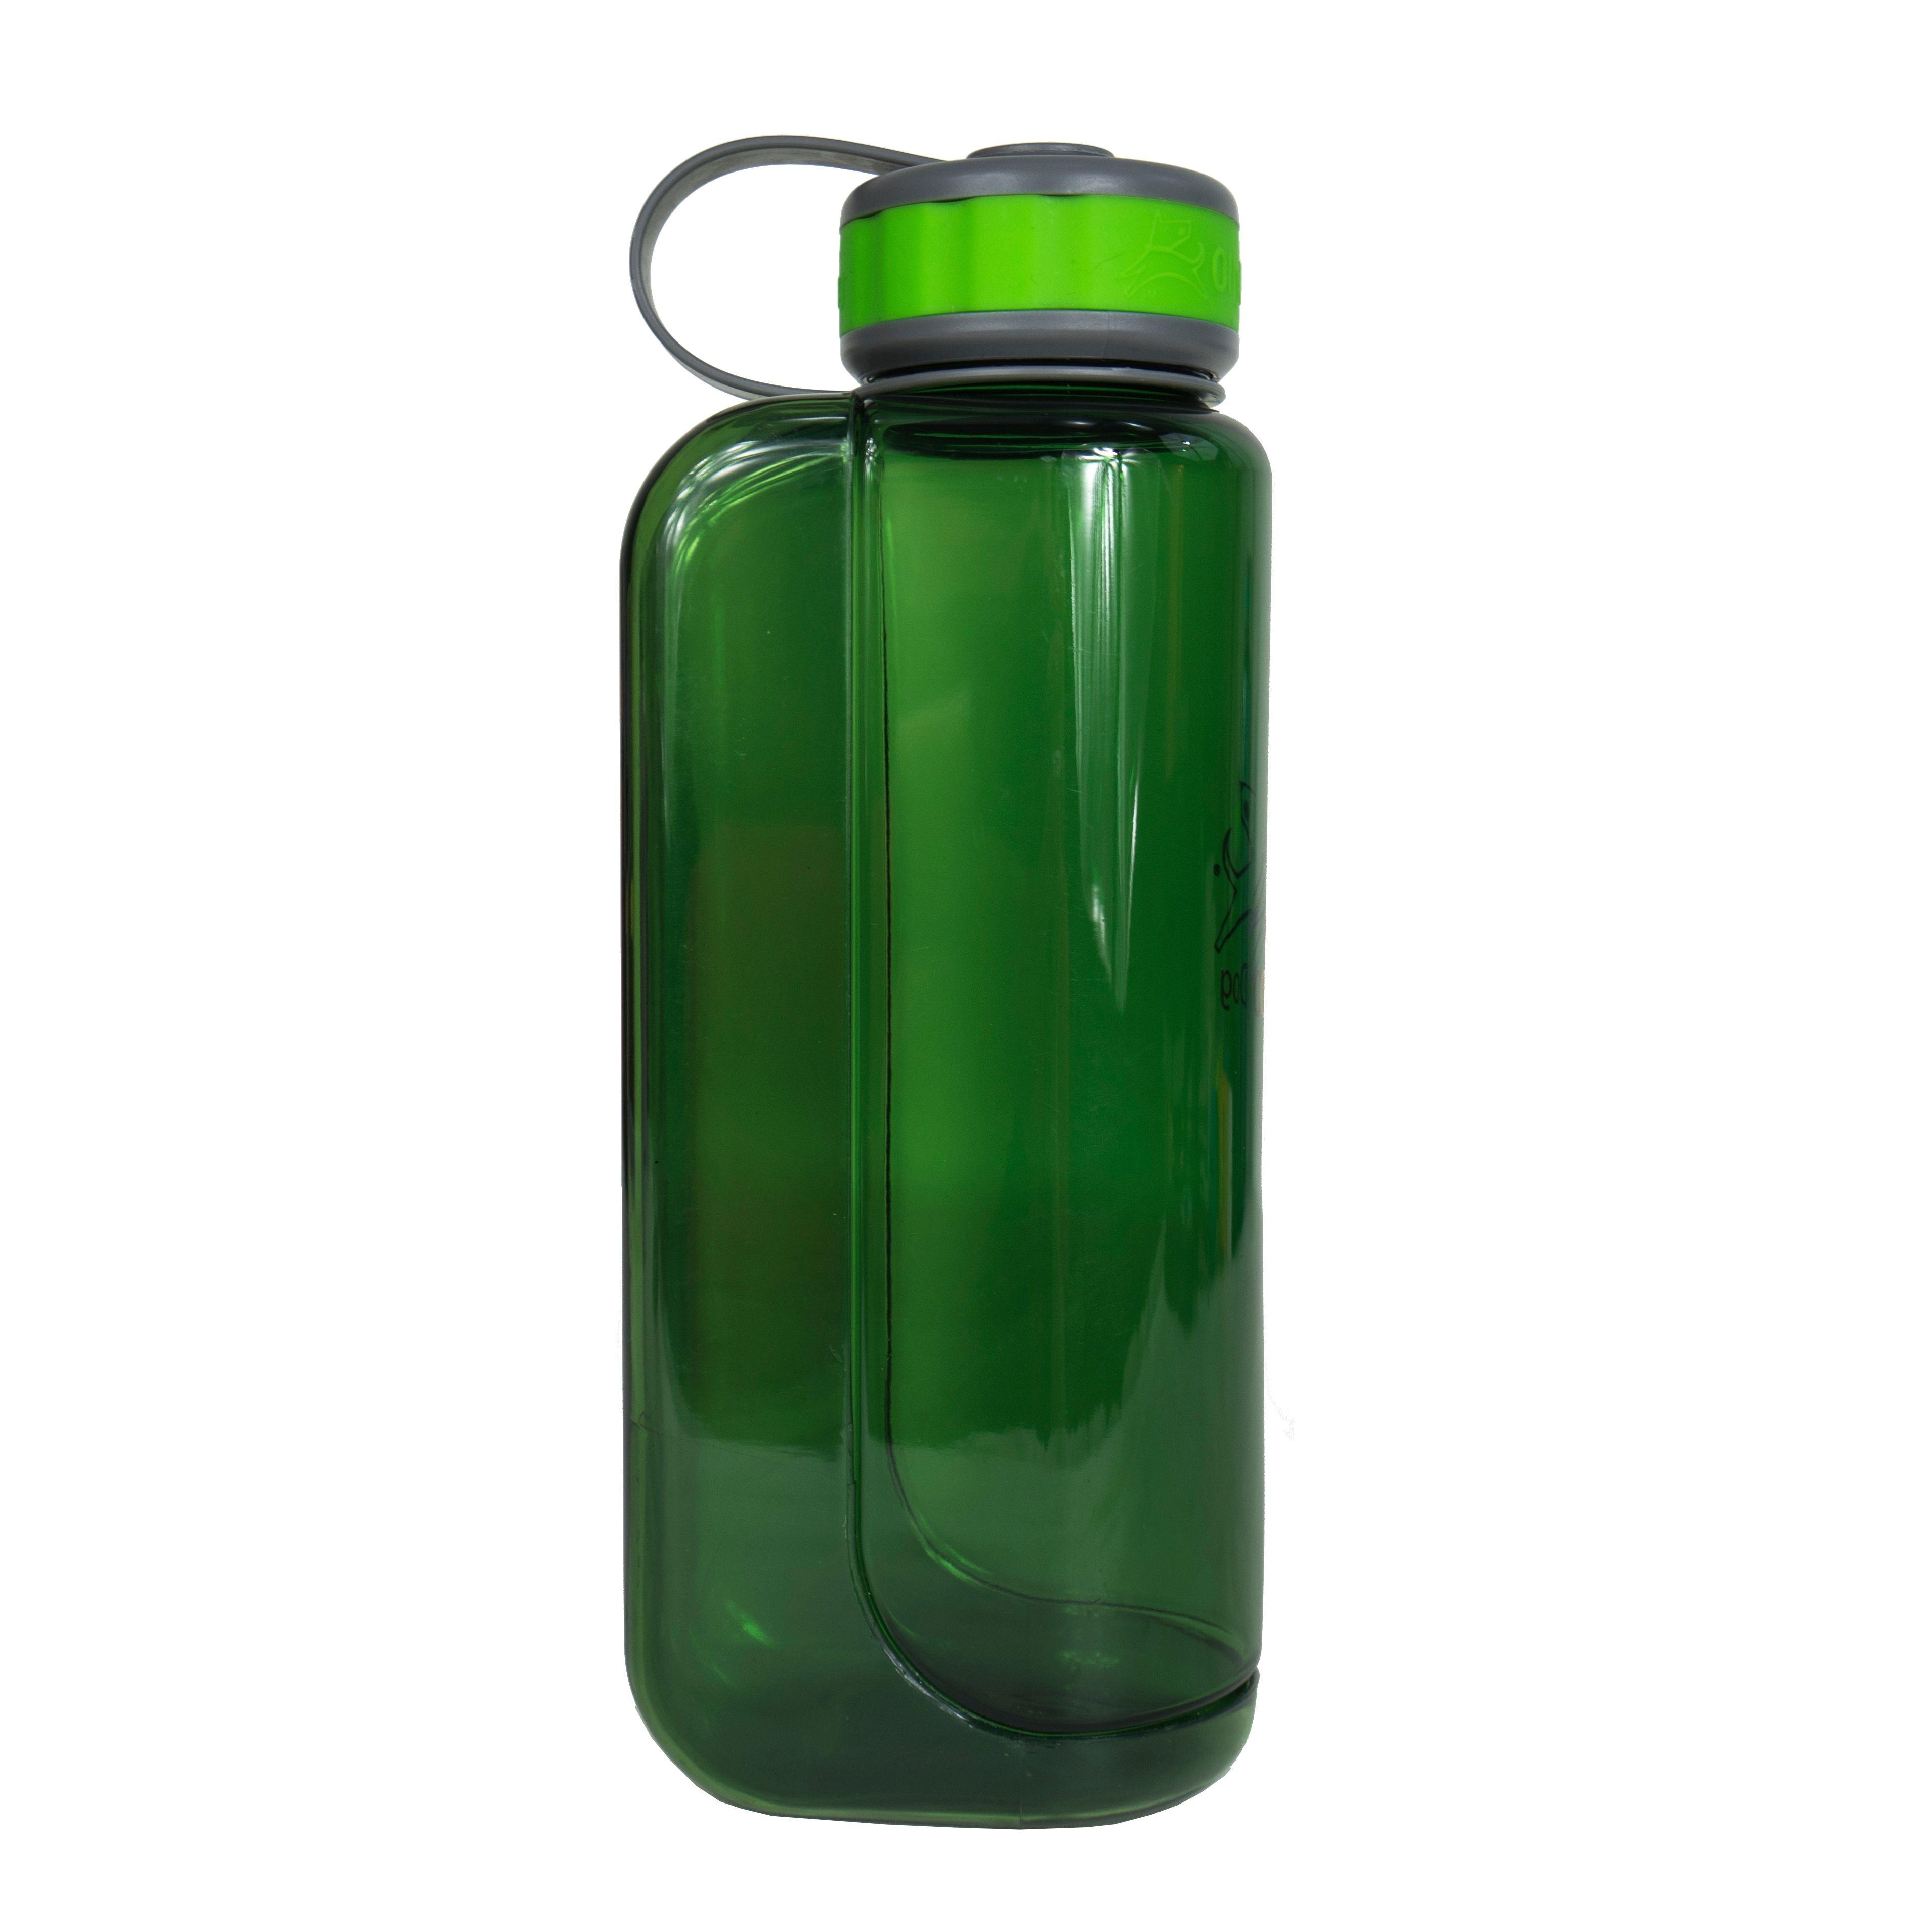 vattenflaska-olly-bottle-grass